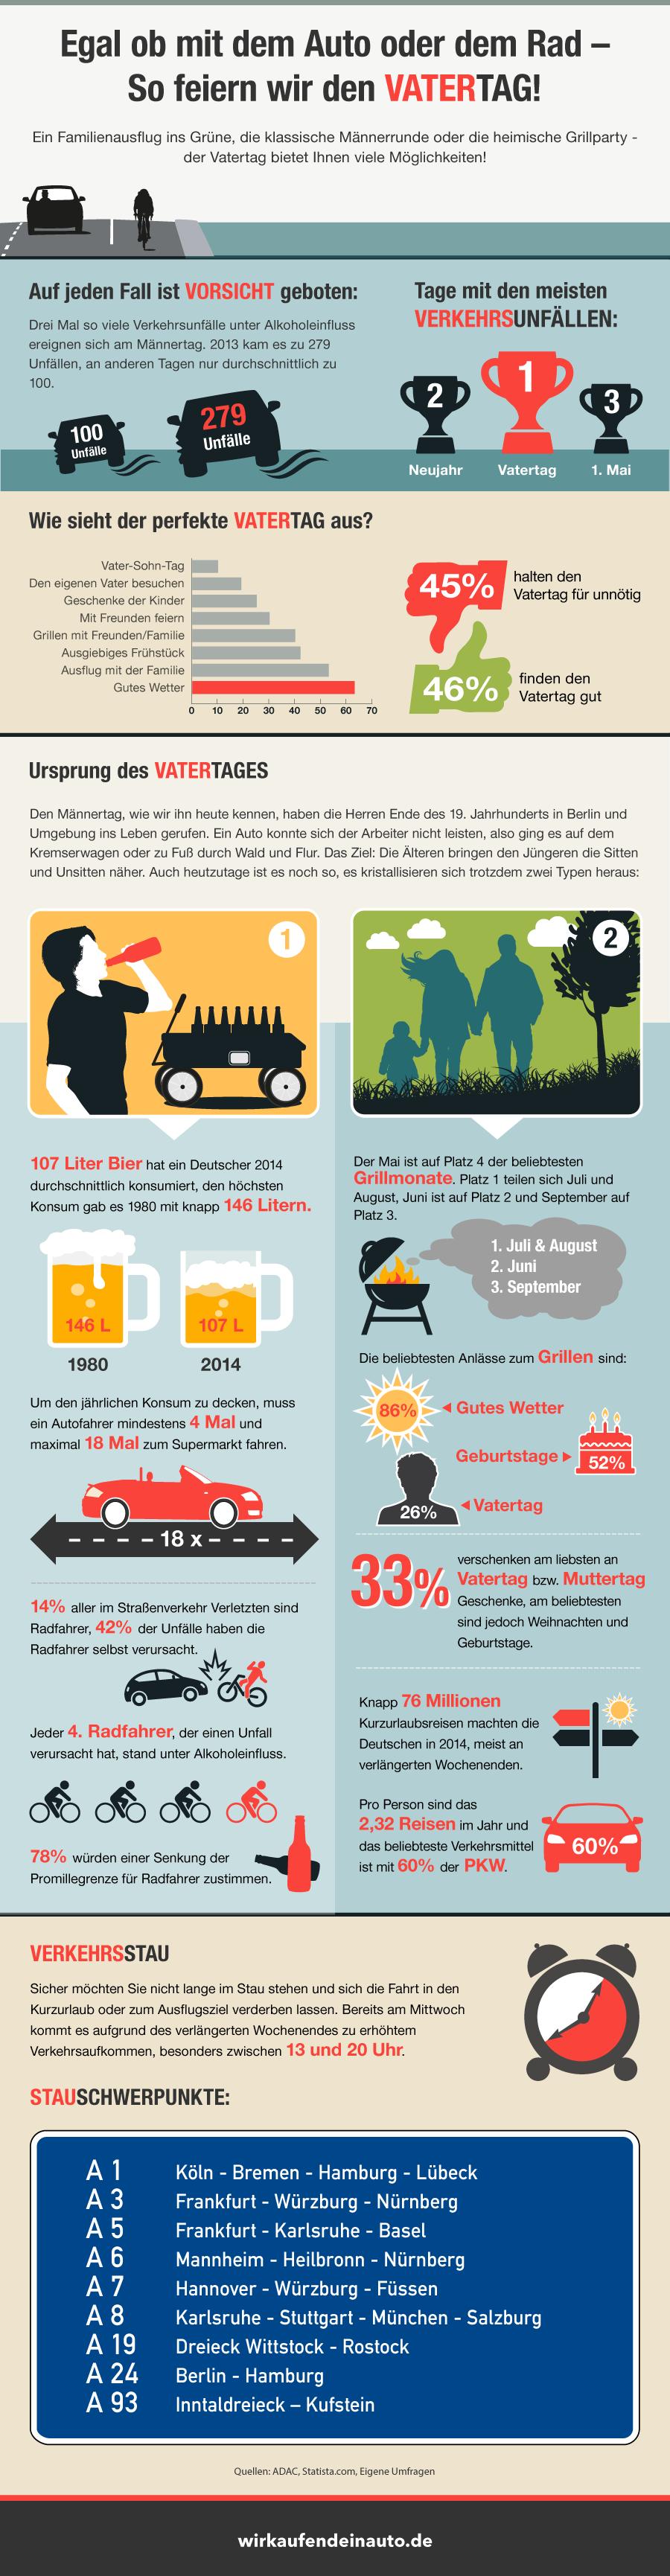 Vatertag 2015 Fakten